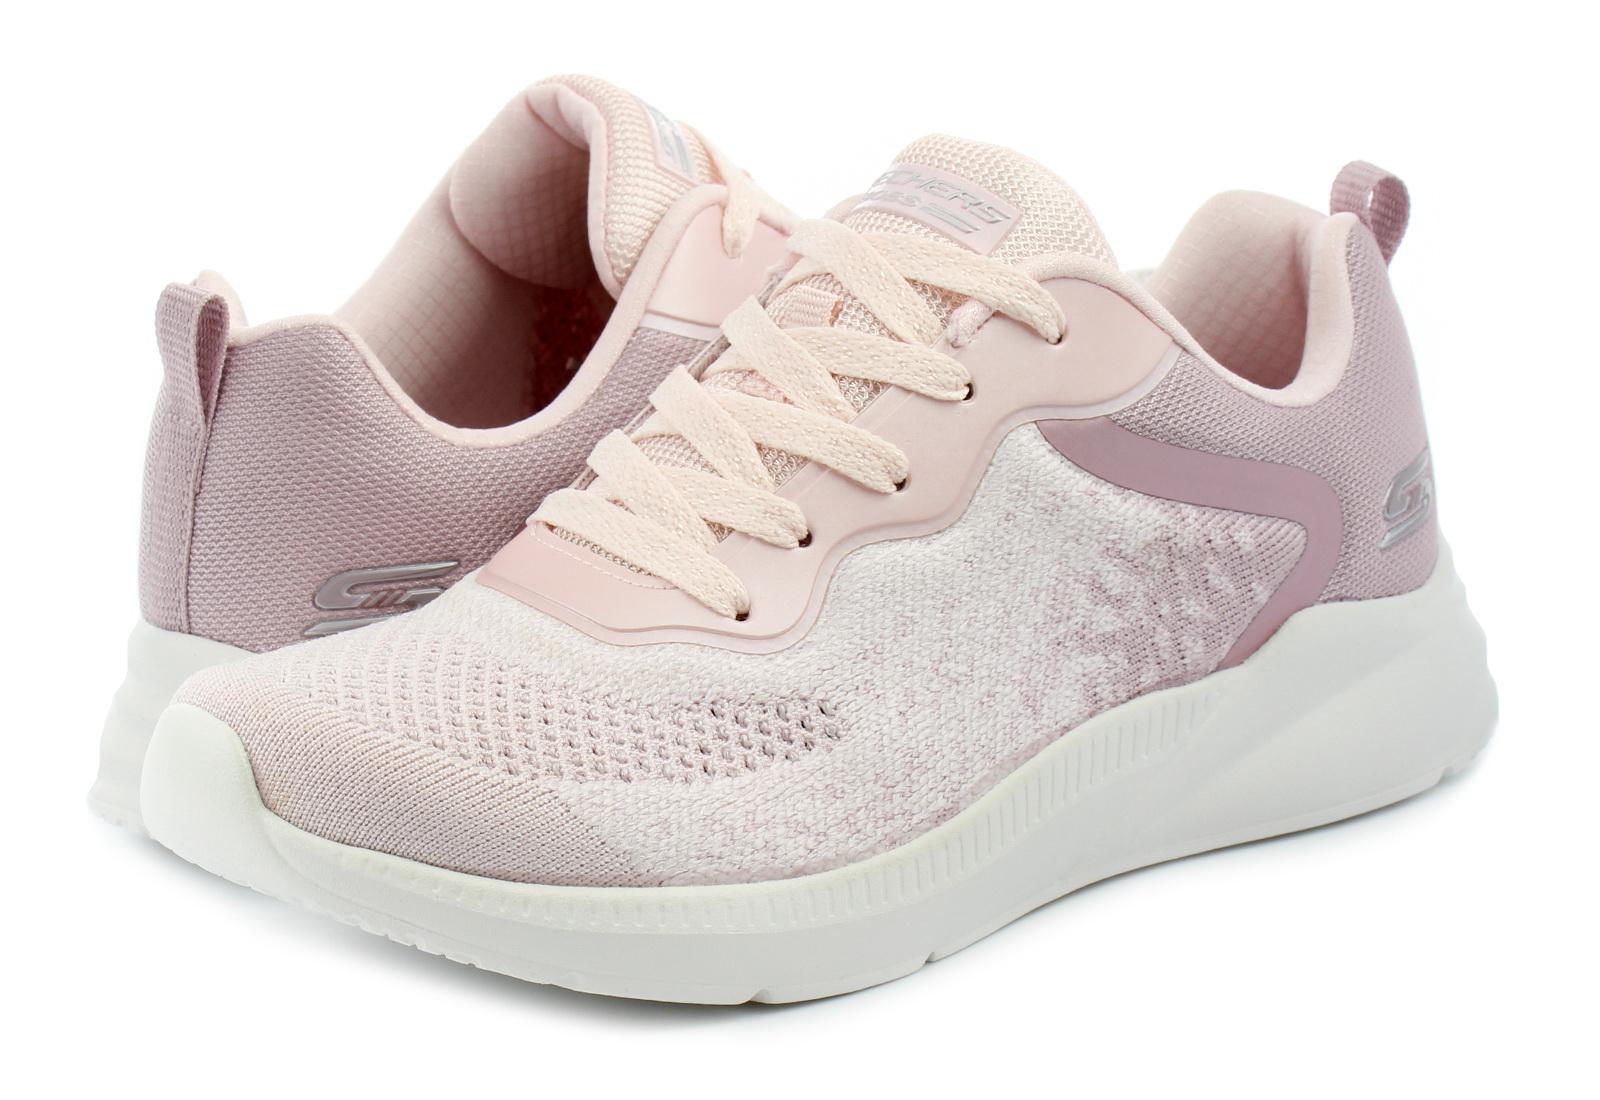 Skechers Ariana Metro Racket damskie buty